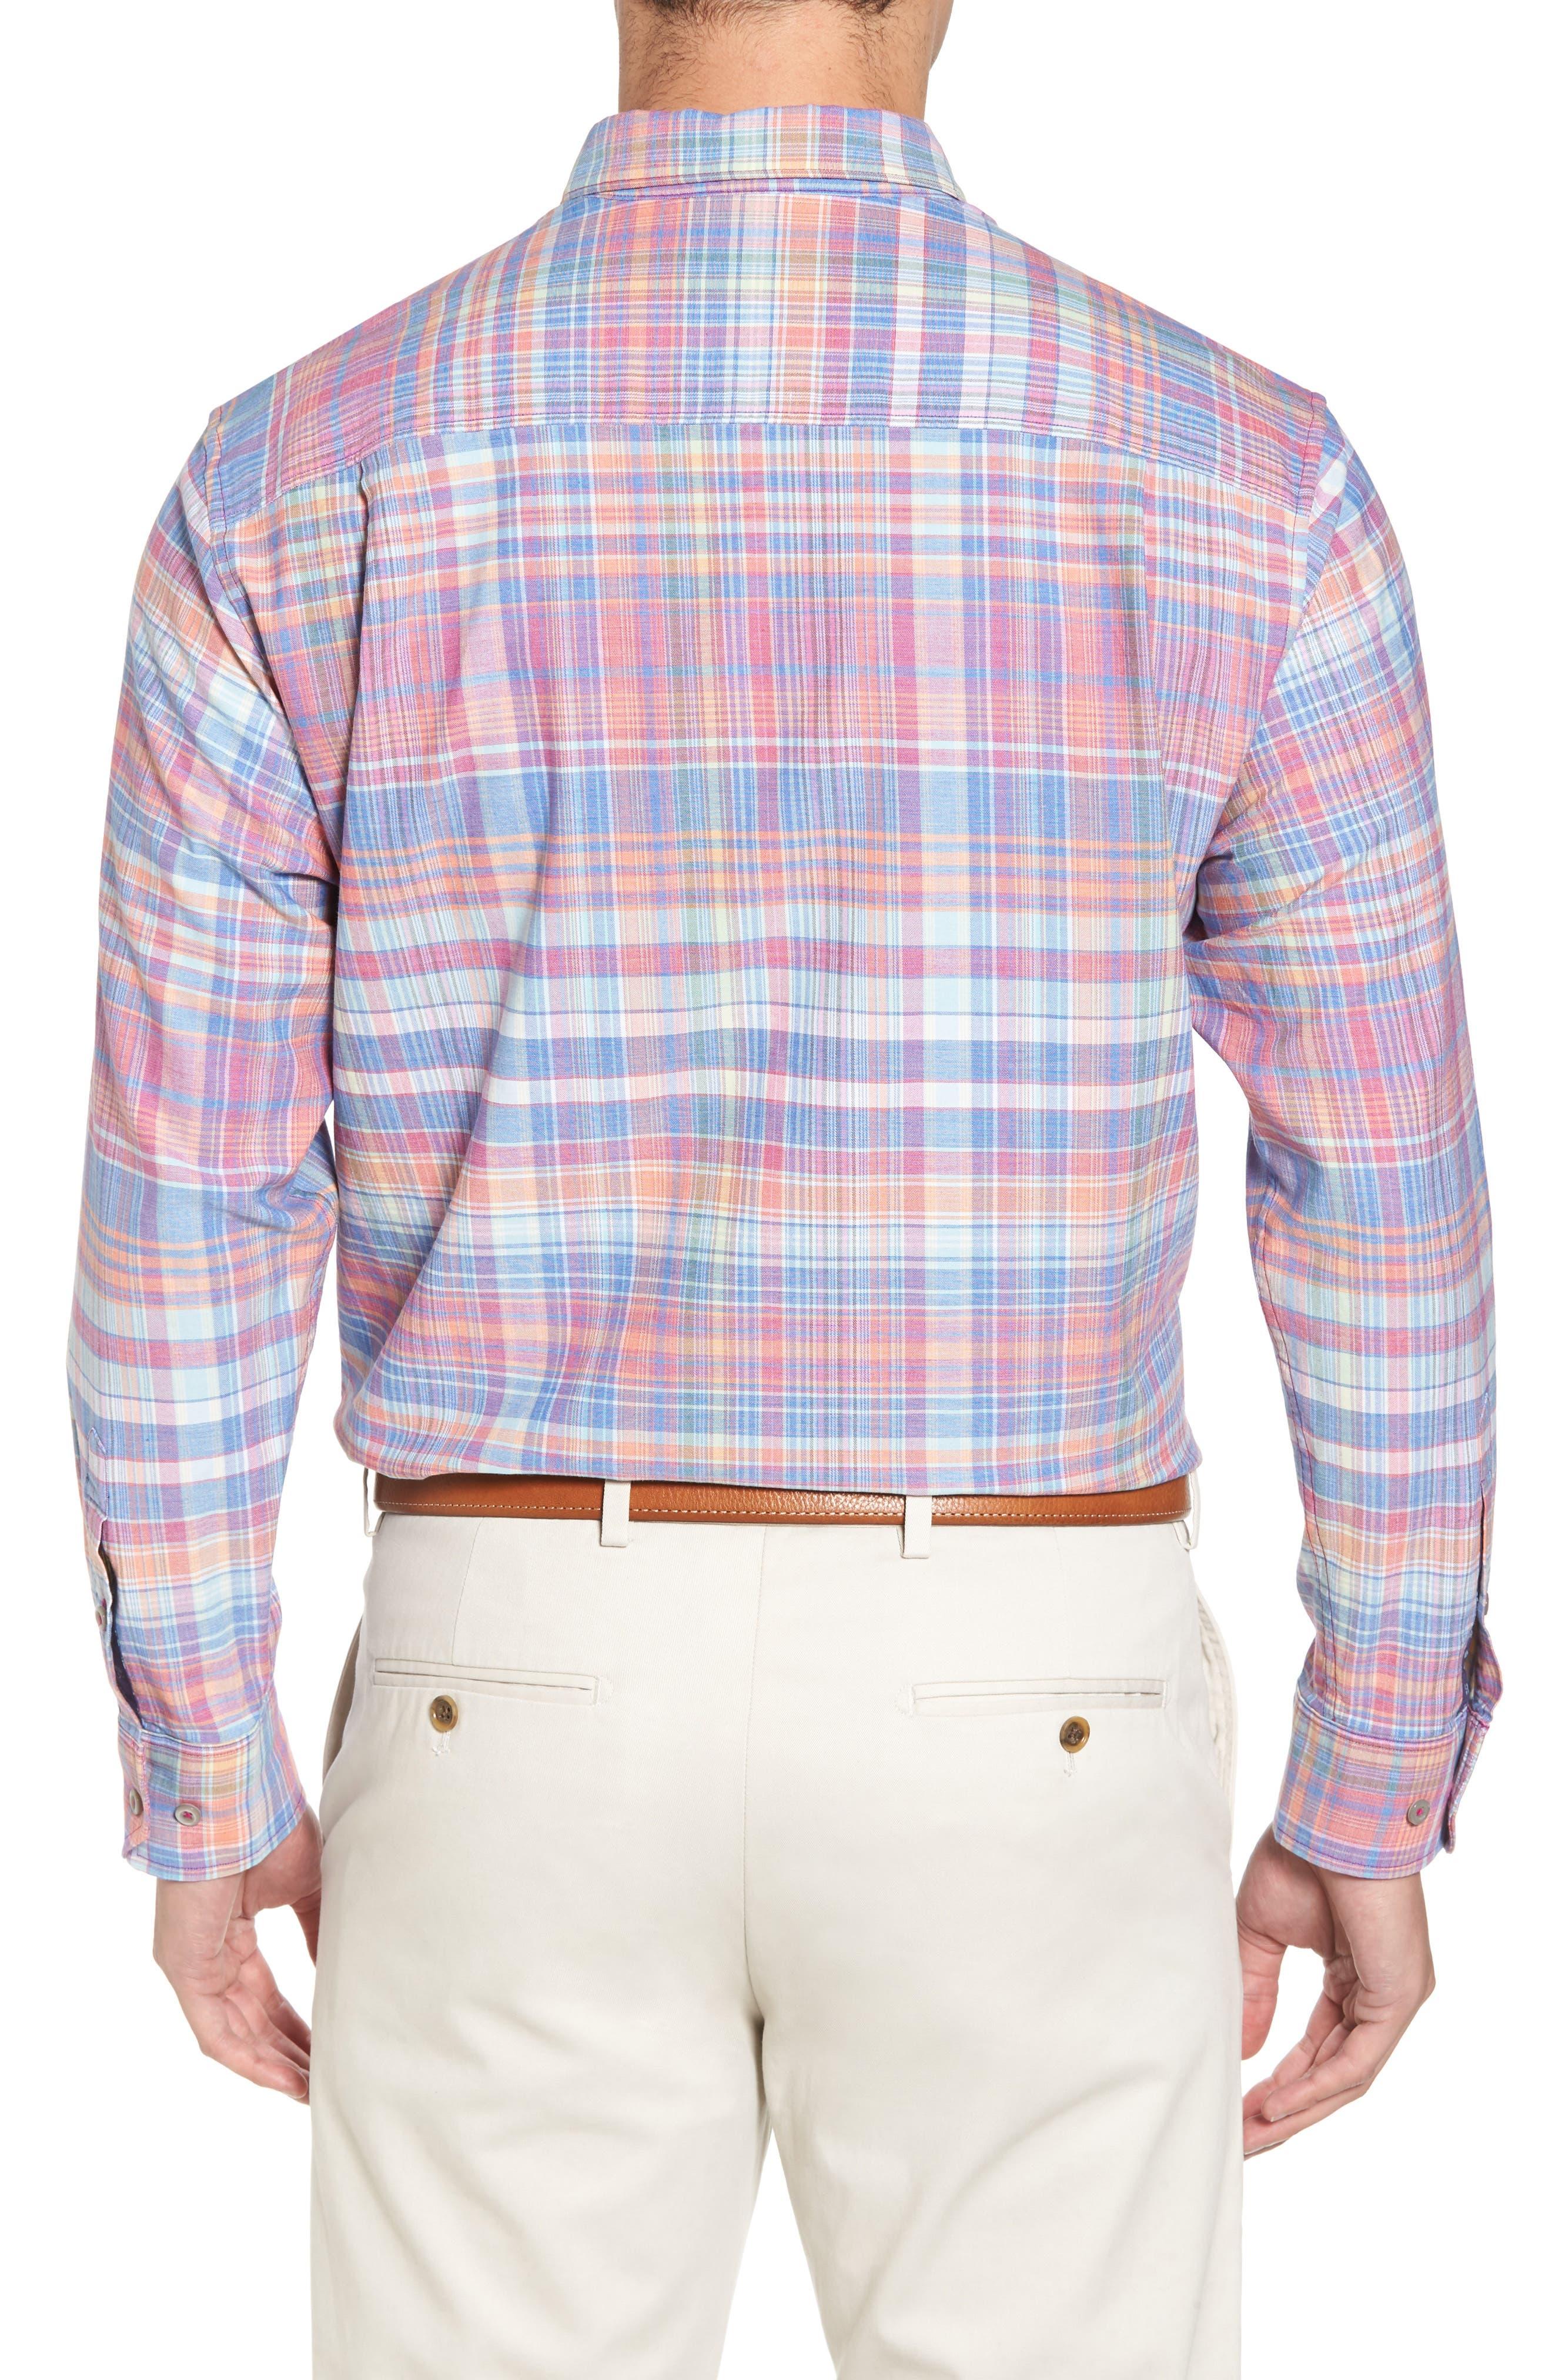 Mangrove Madras Plaid Sport Shirt,                             Alternate thumbnail 2, color,                             650